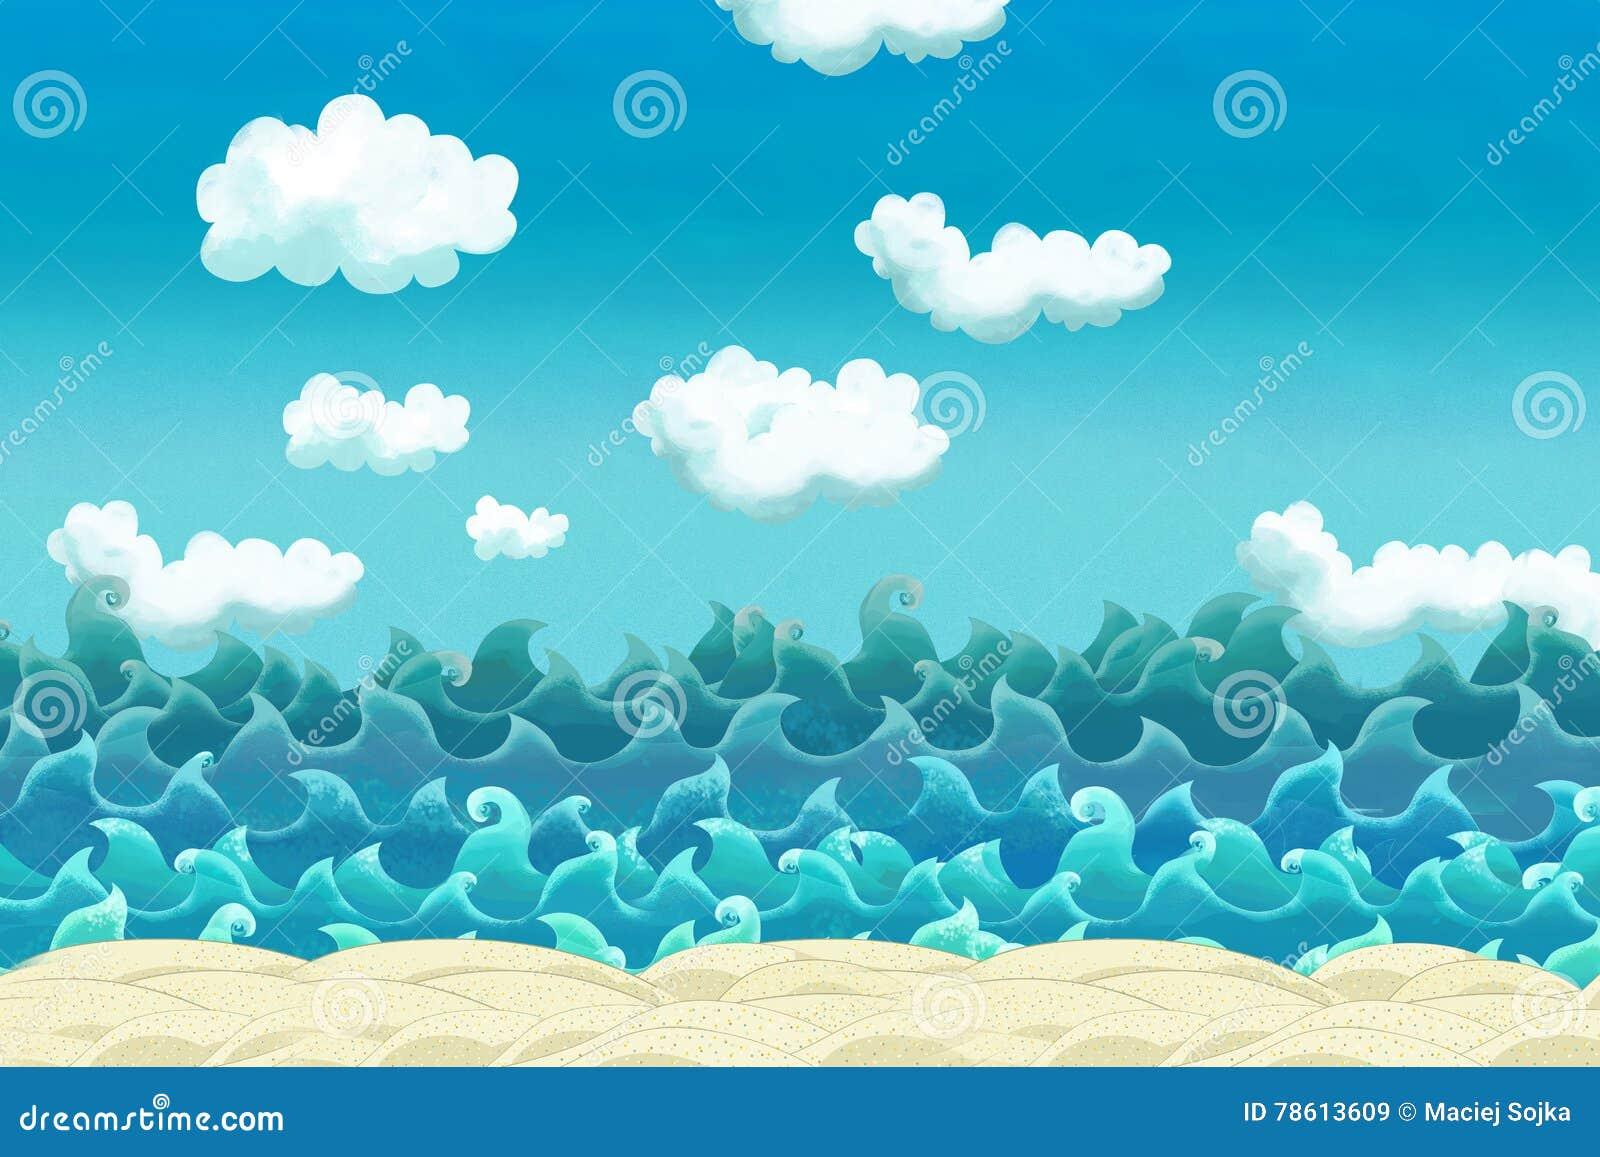 Cartoon scene of beach near the sea or ocean